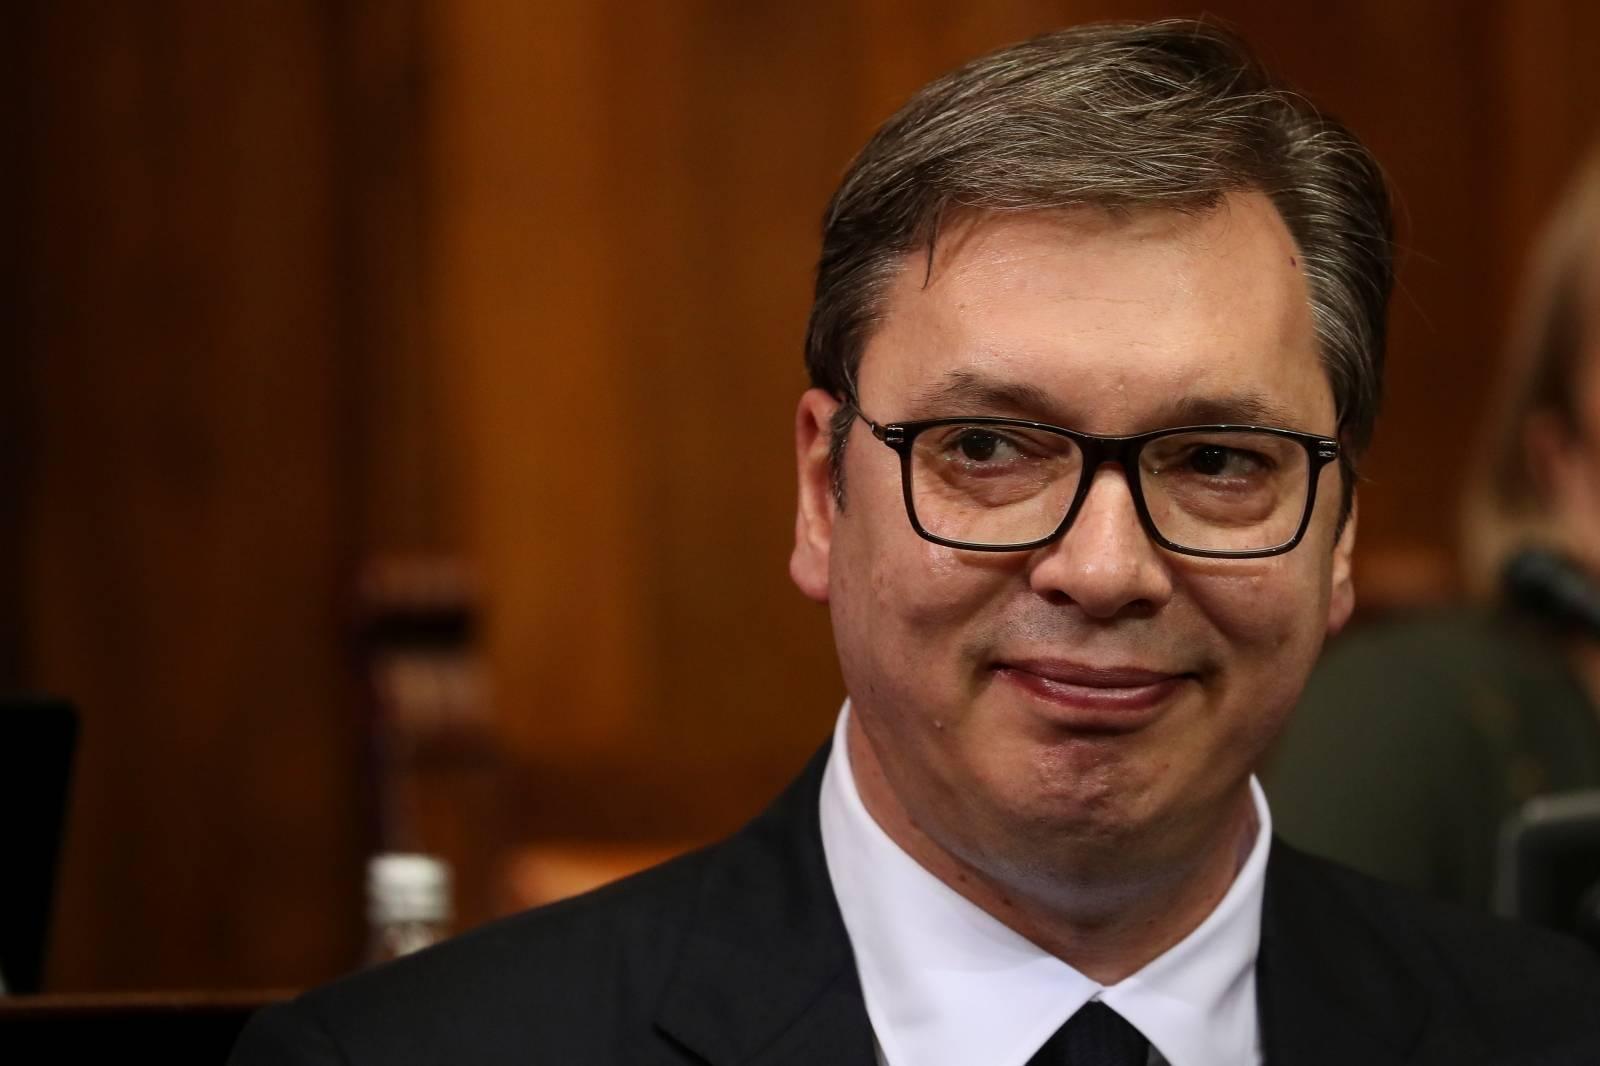 Serbia's President Vucic addresses parliament over Kosovo